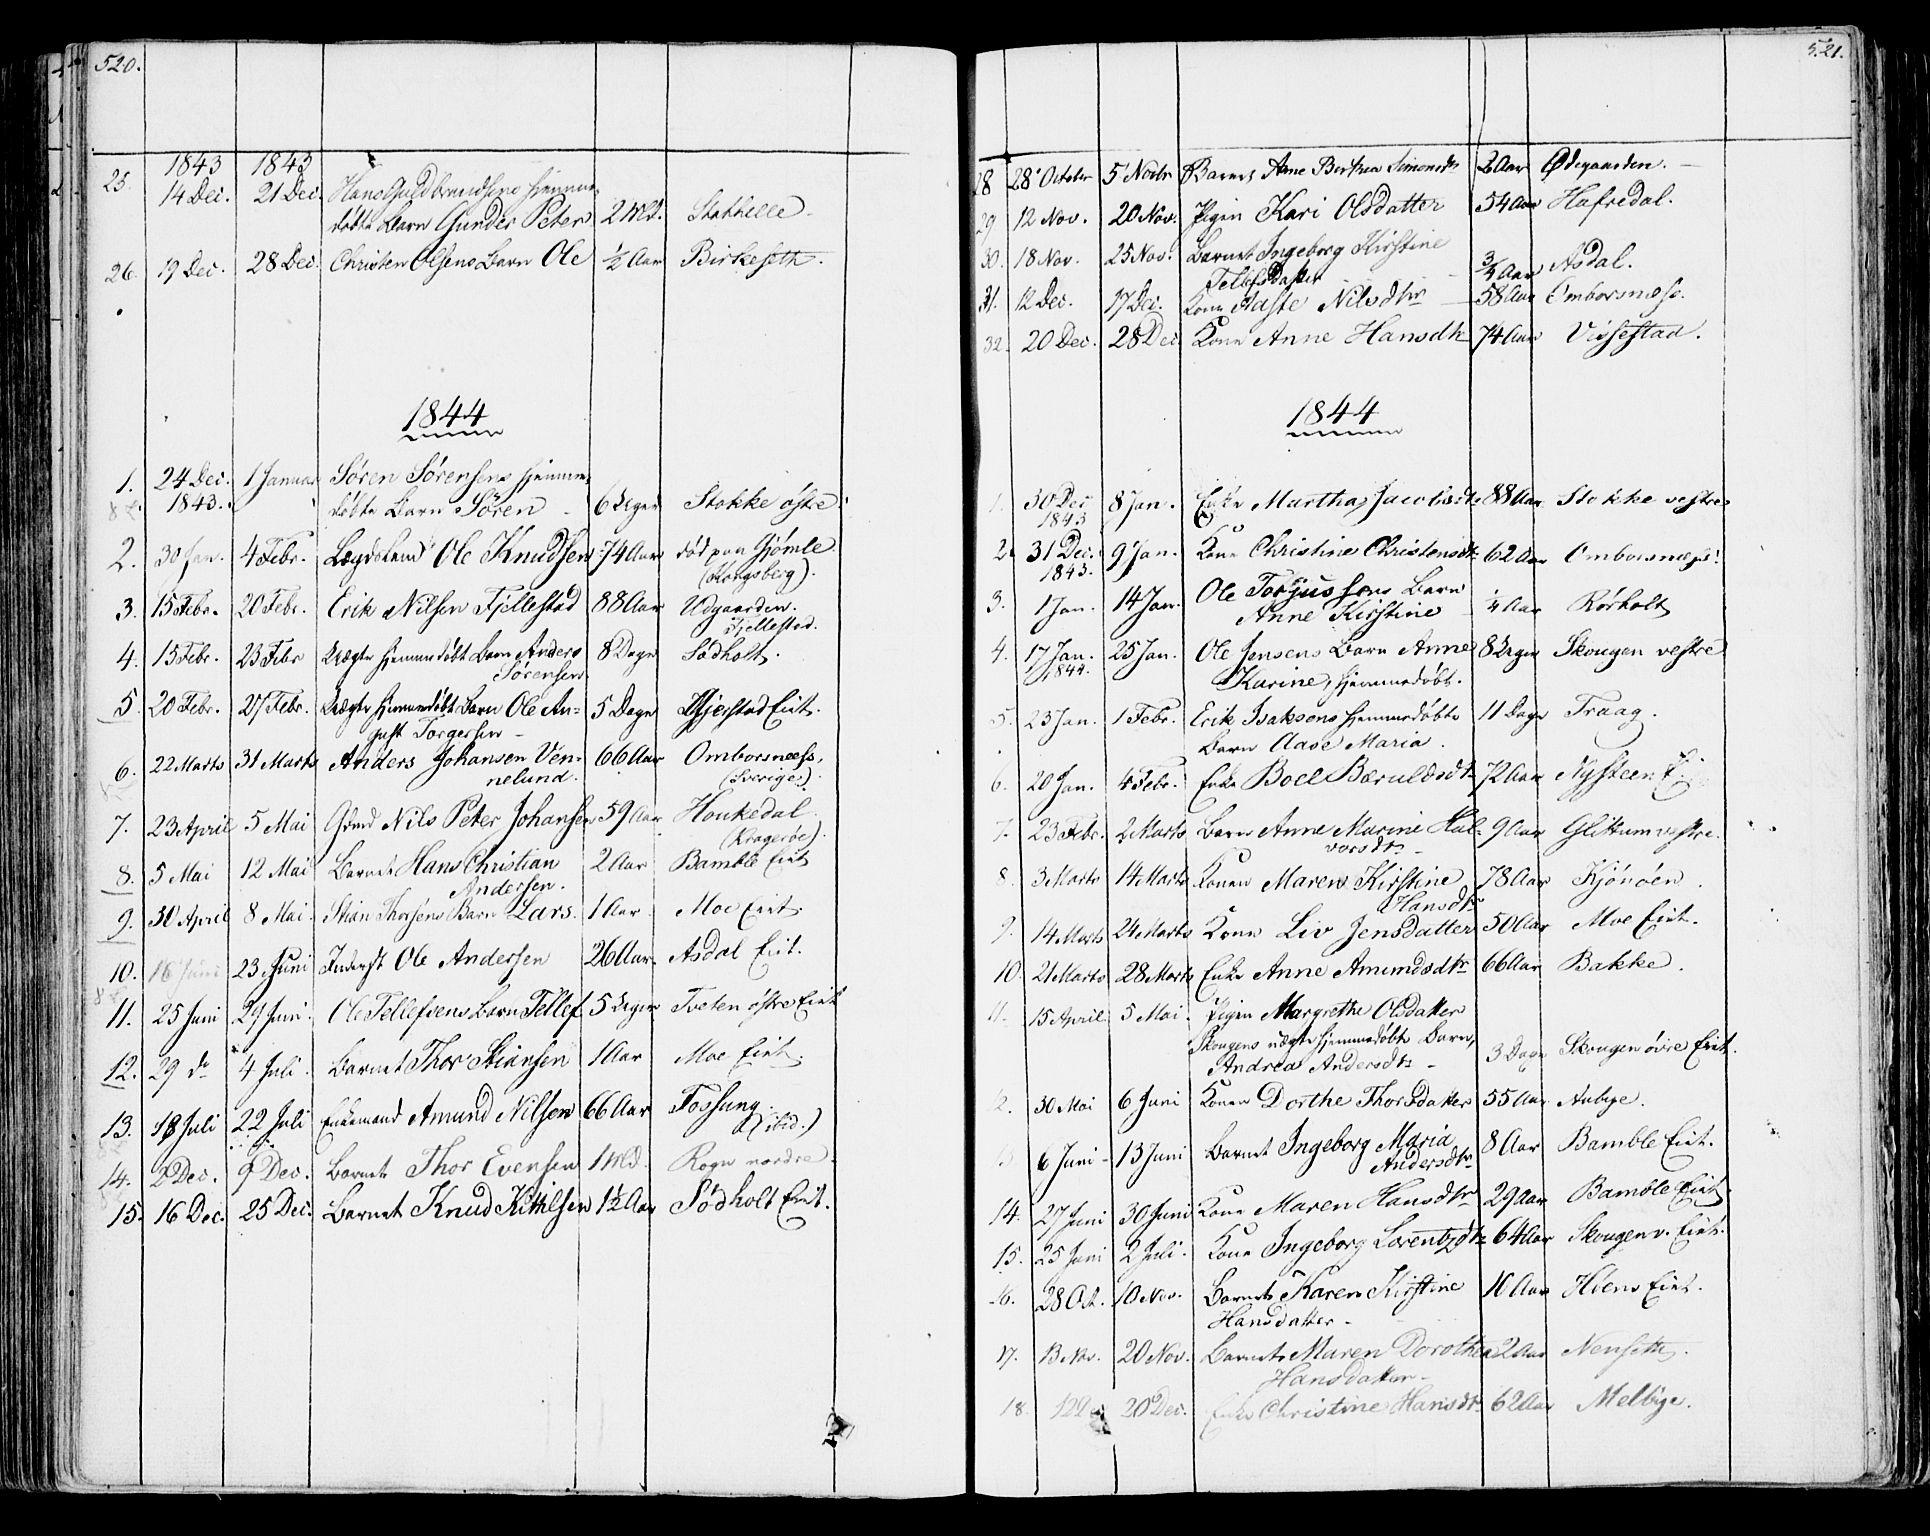 SAKO, Bamble kirkebøker, F/Fa/L0004: Ministerialbok nr. I 4, 1834-1853, s. 520-521